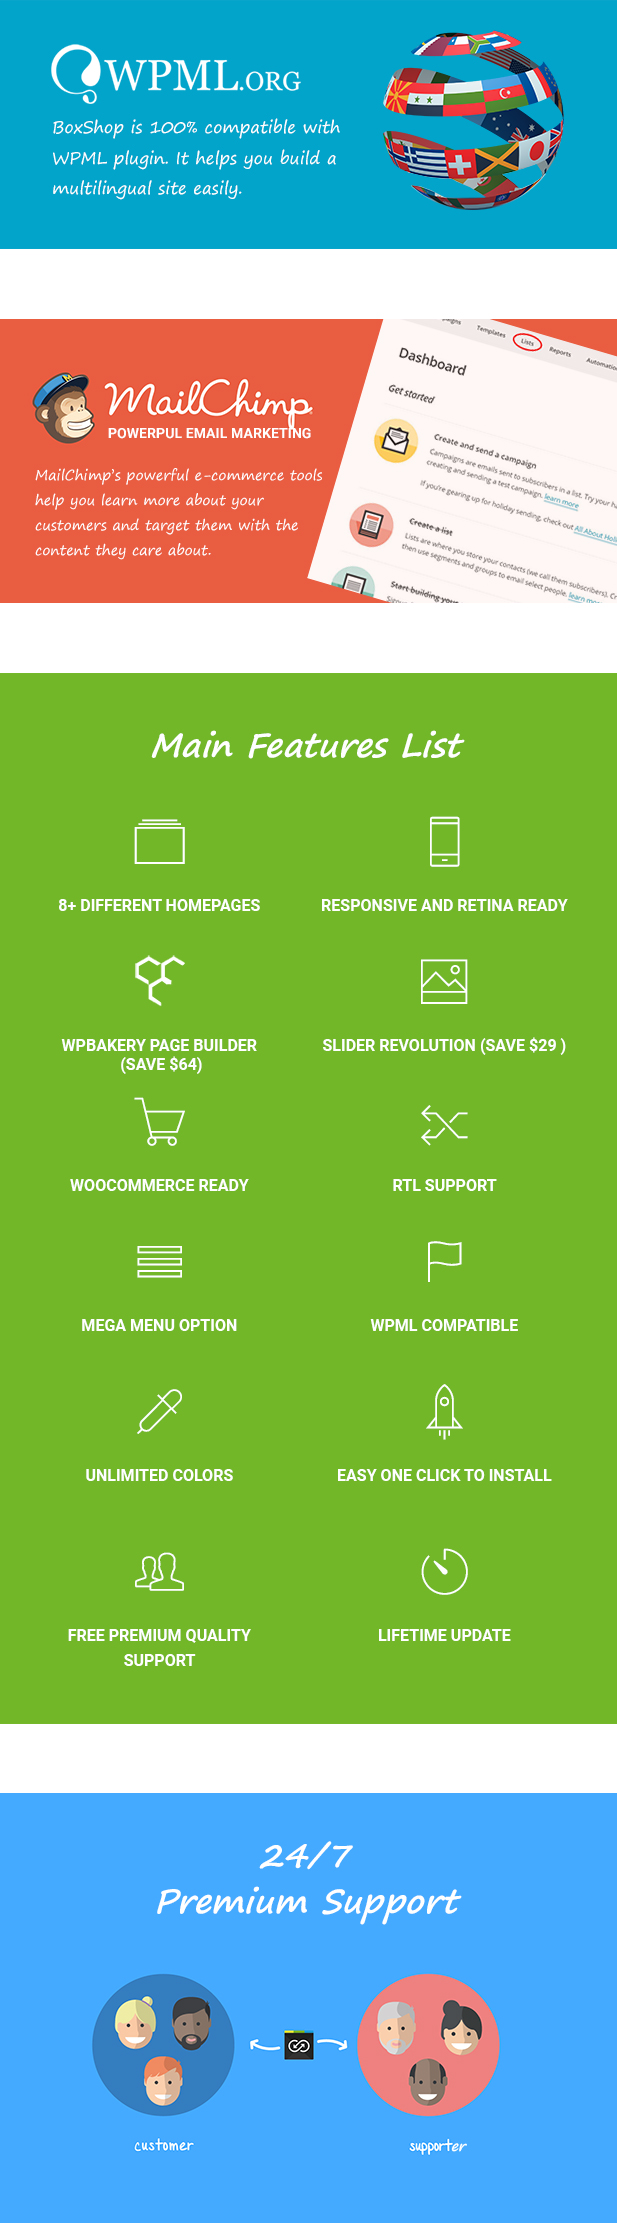 content 7 2 - BoxShop - Responsive WooCommerce WordPress Theme